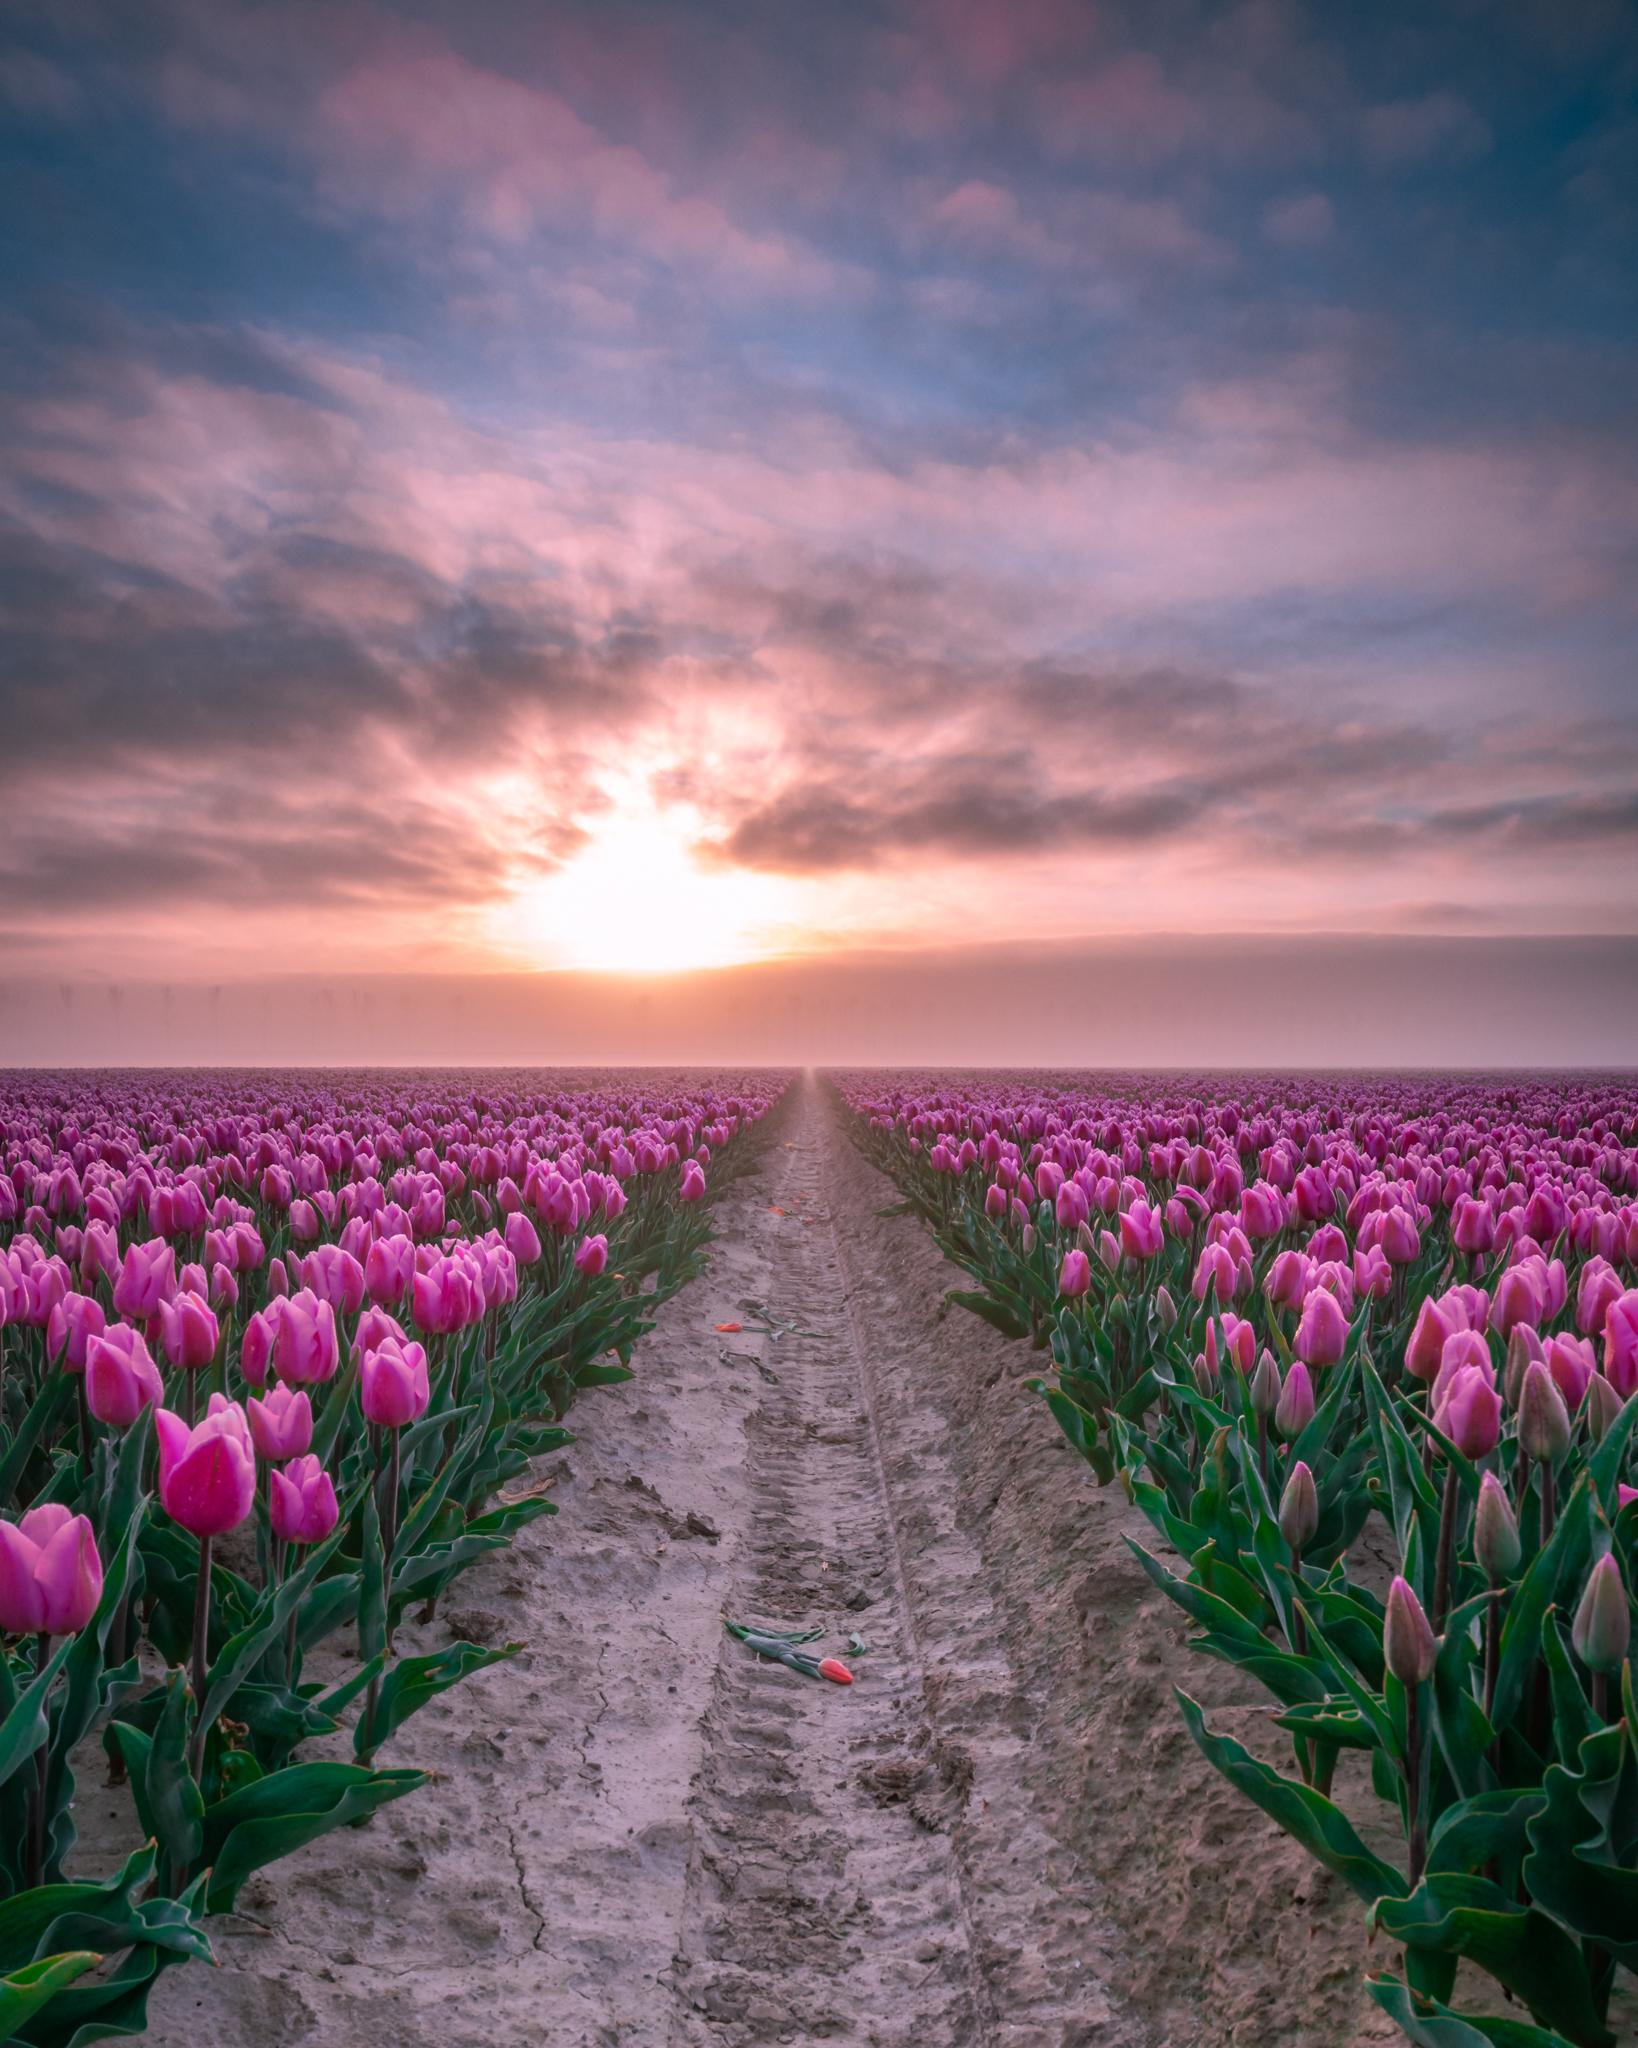 Spektakel tussen de tulpen